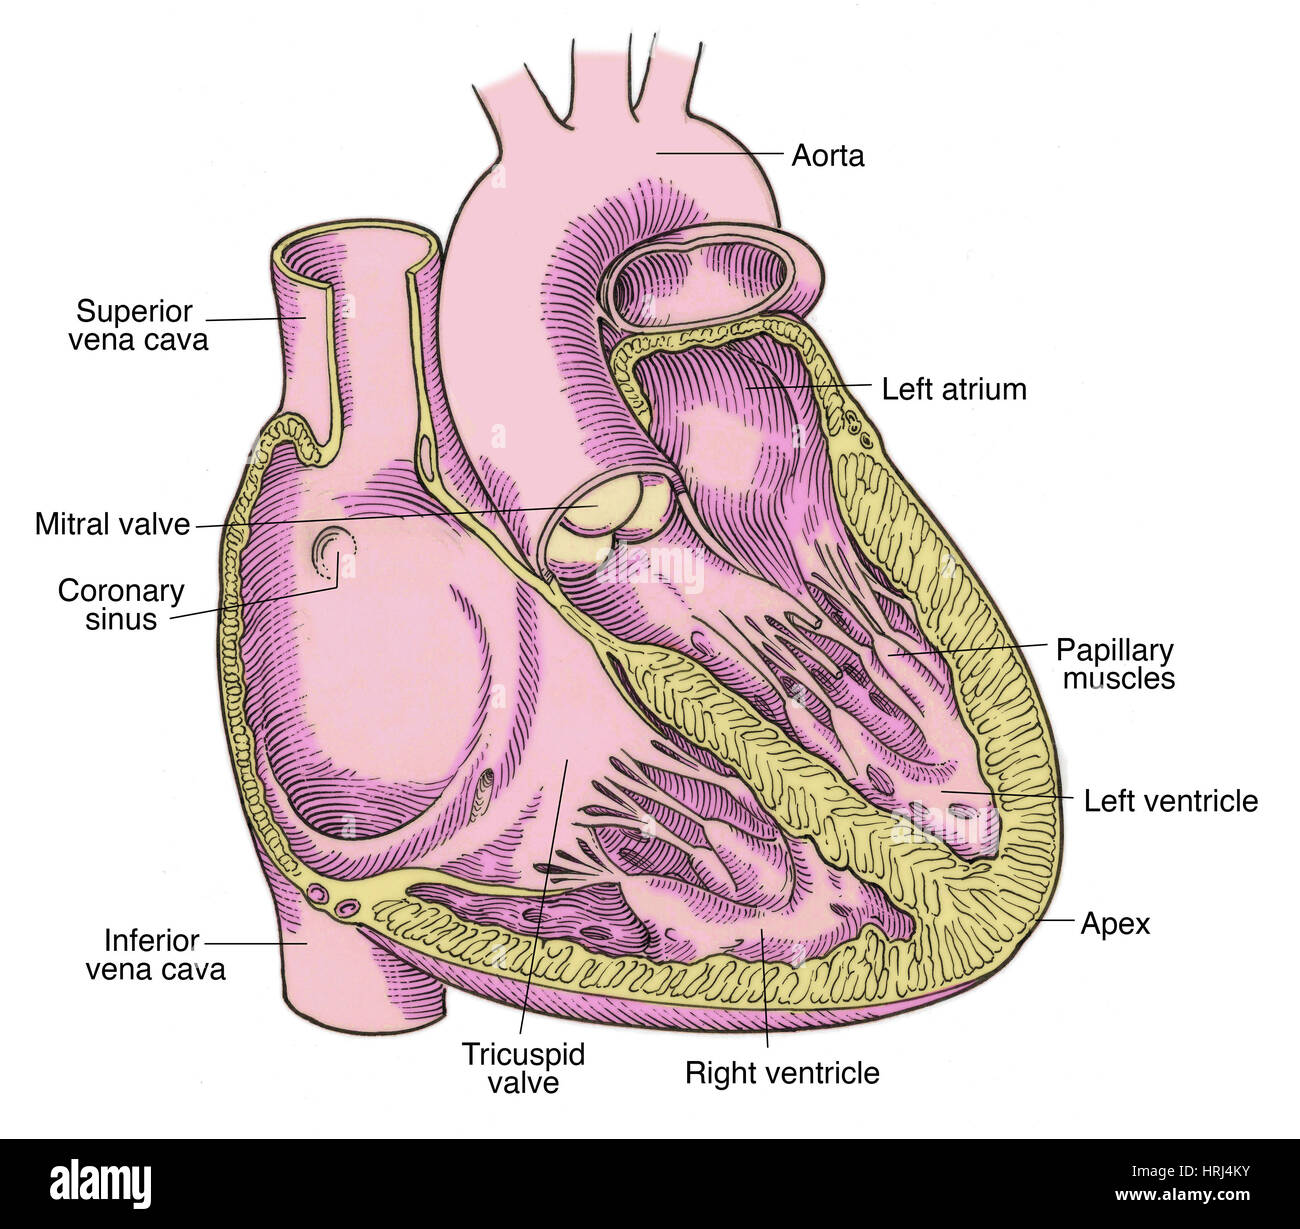 Illustration of Heart Anatomy Stock Photo: 135008495 - Alamy